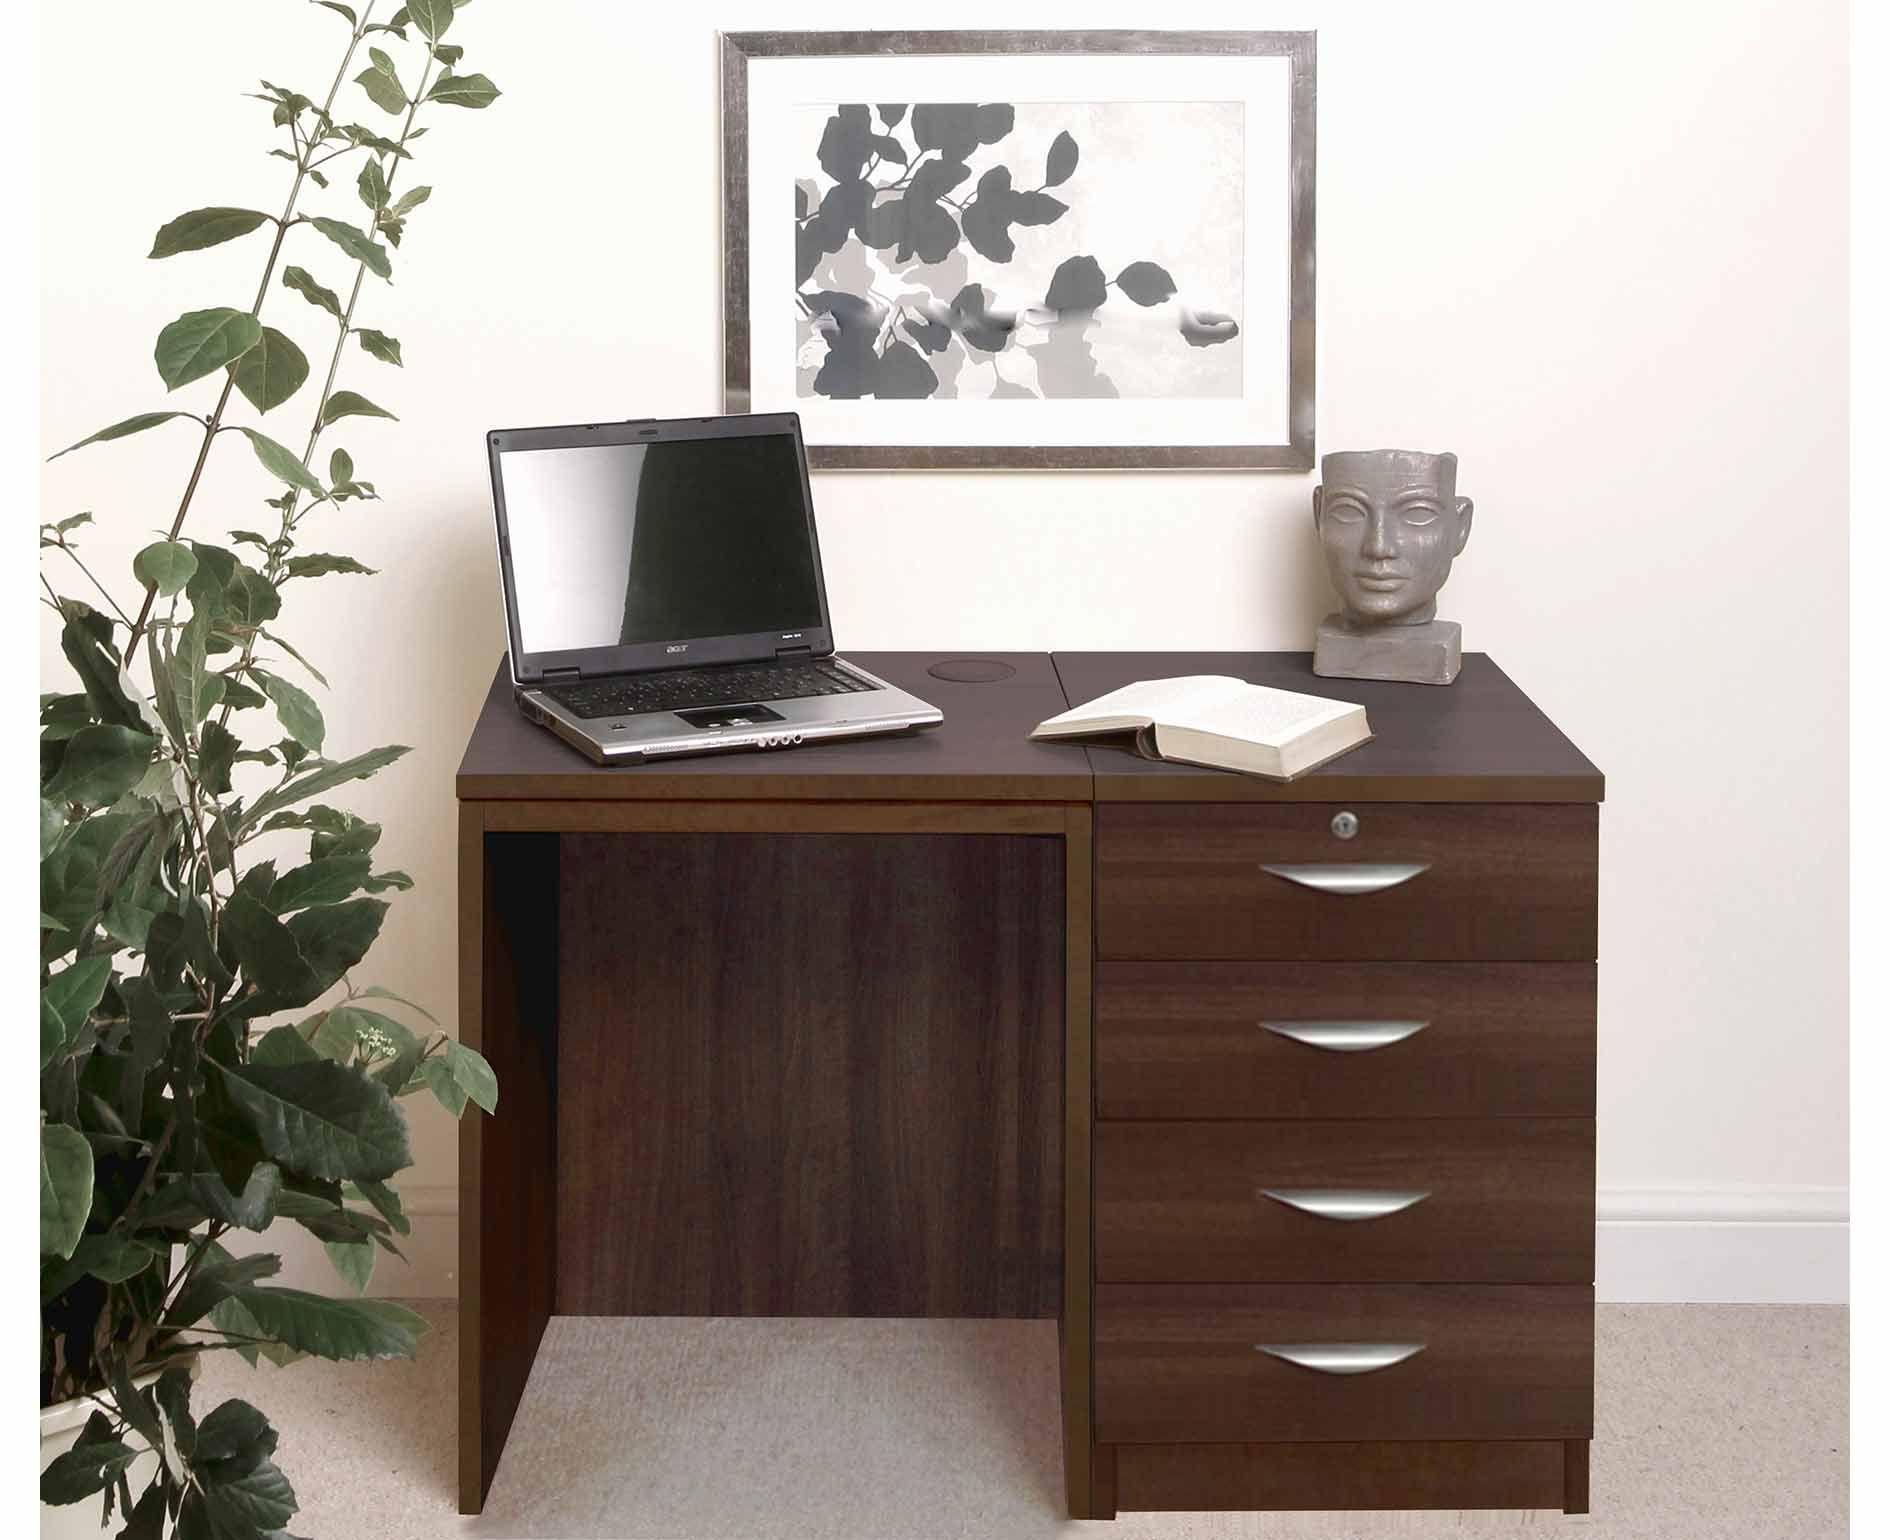 Office Furniture Online   Office Furniture   Office Furniture Warehouse   Office  Furniture Stores   Furniture